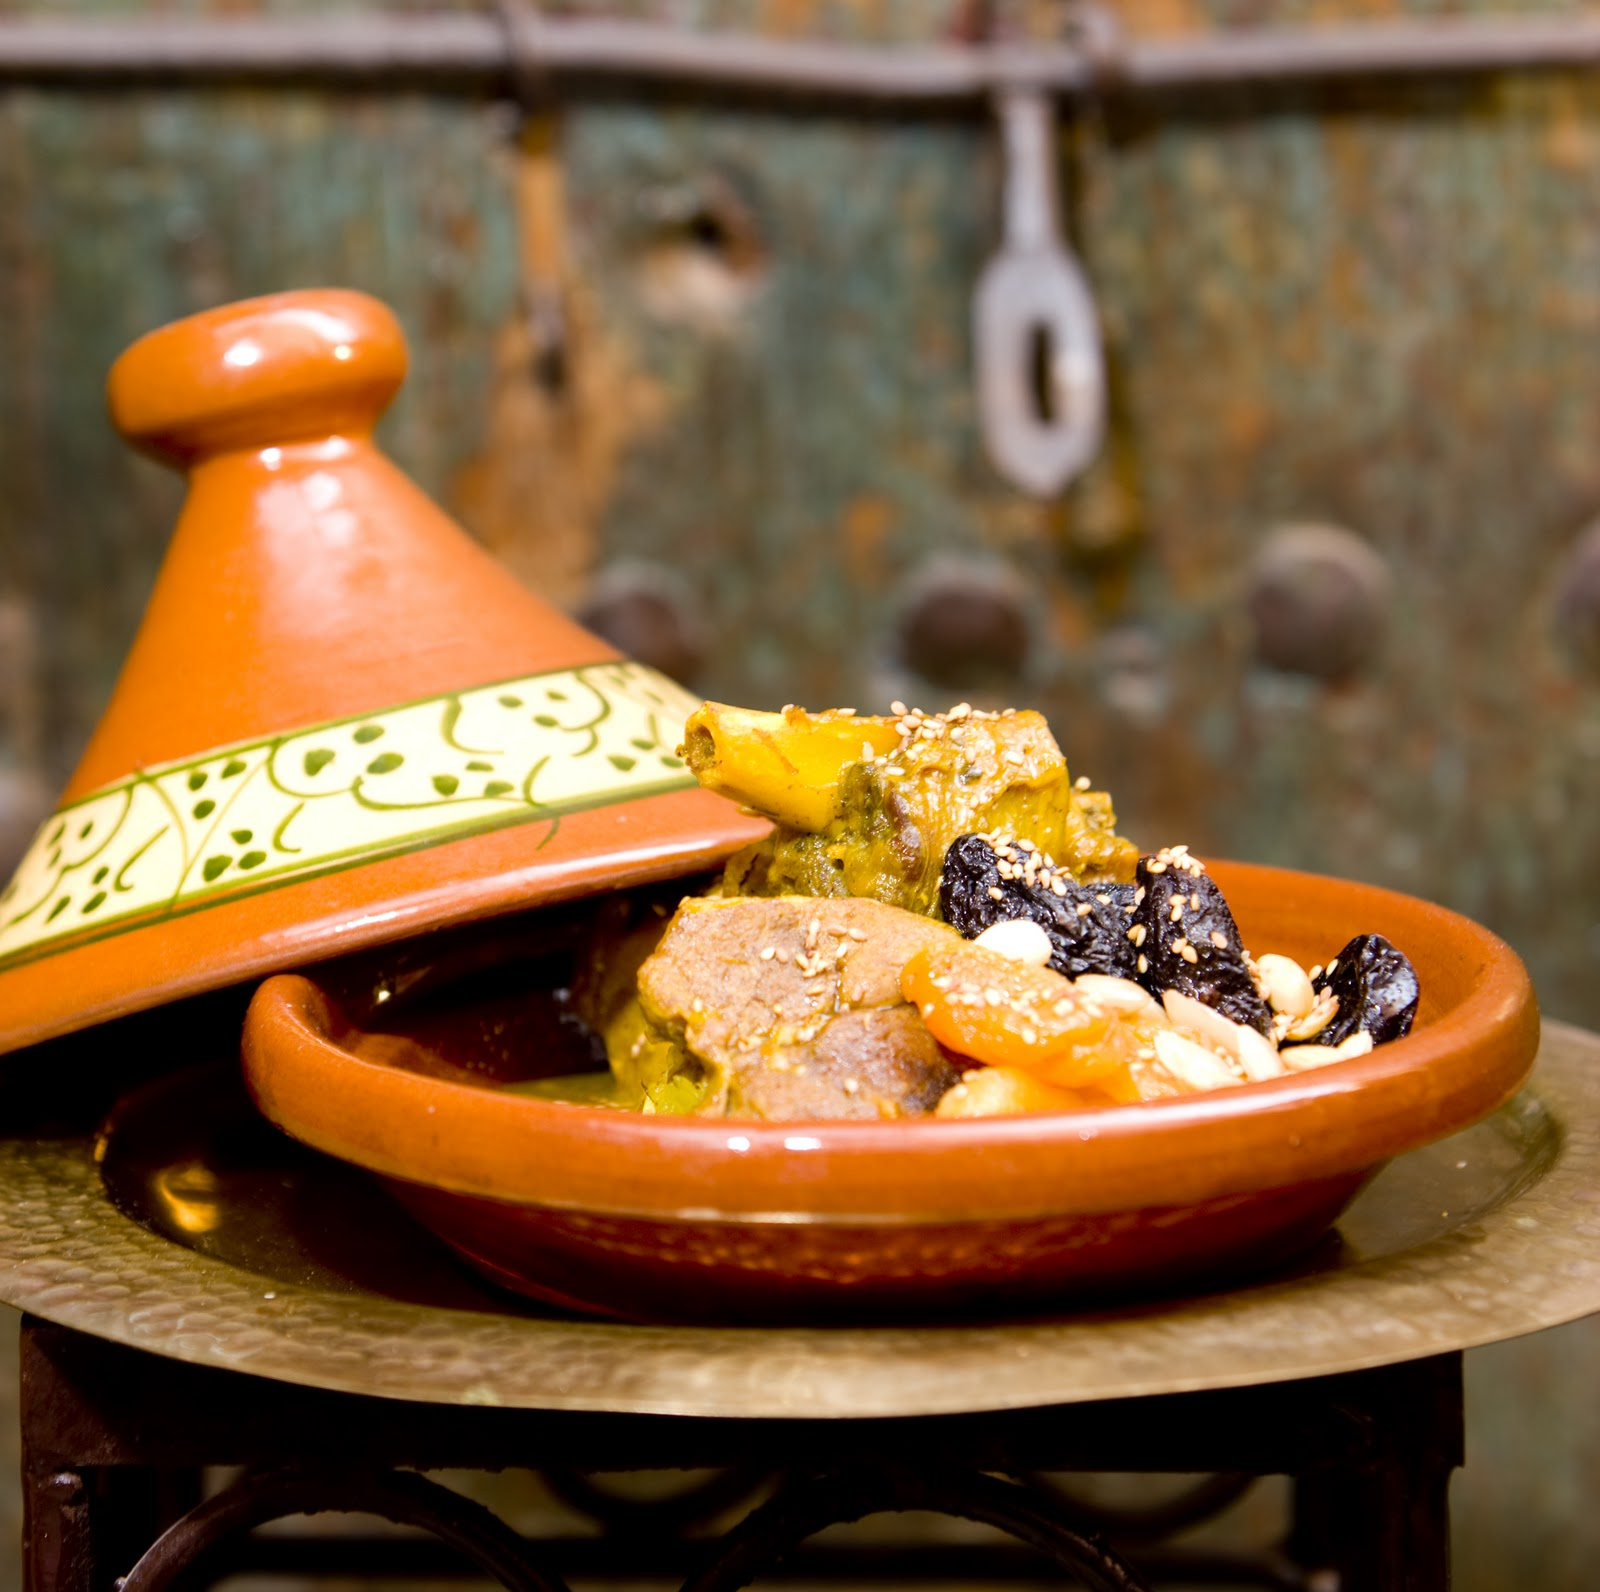 Morocco Saucy Onion